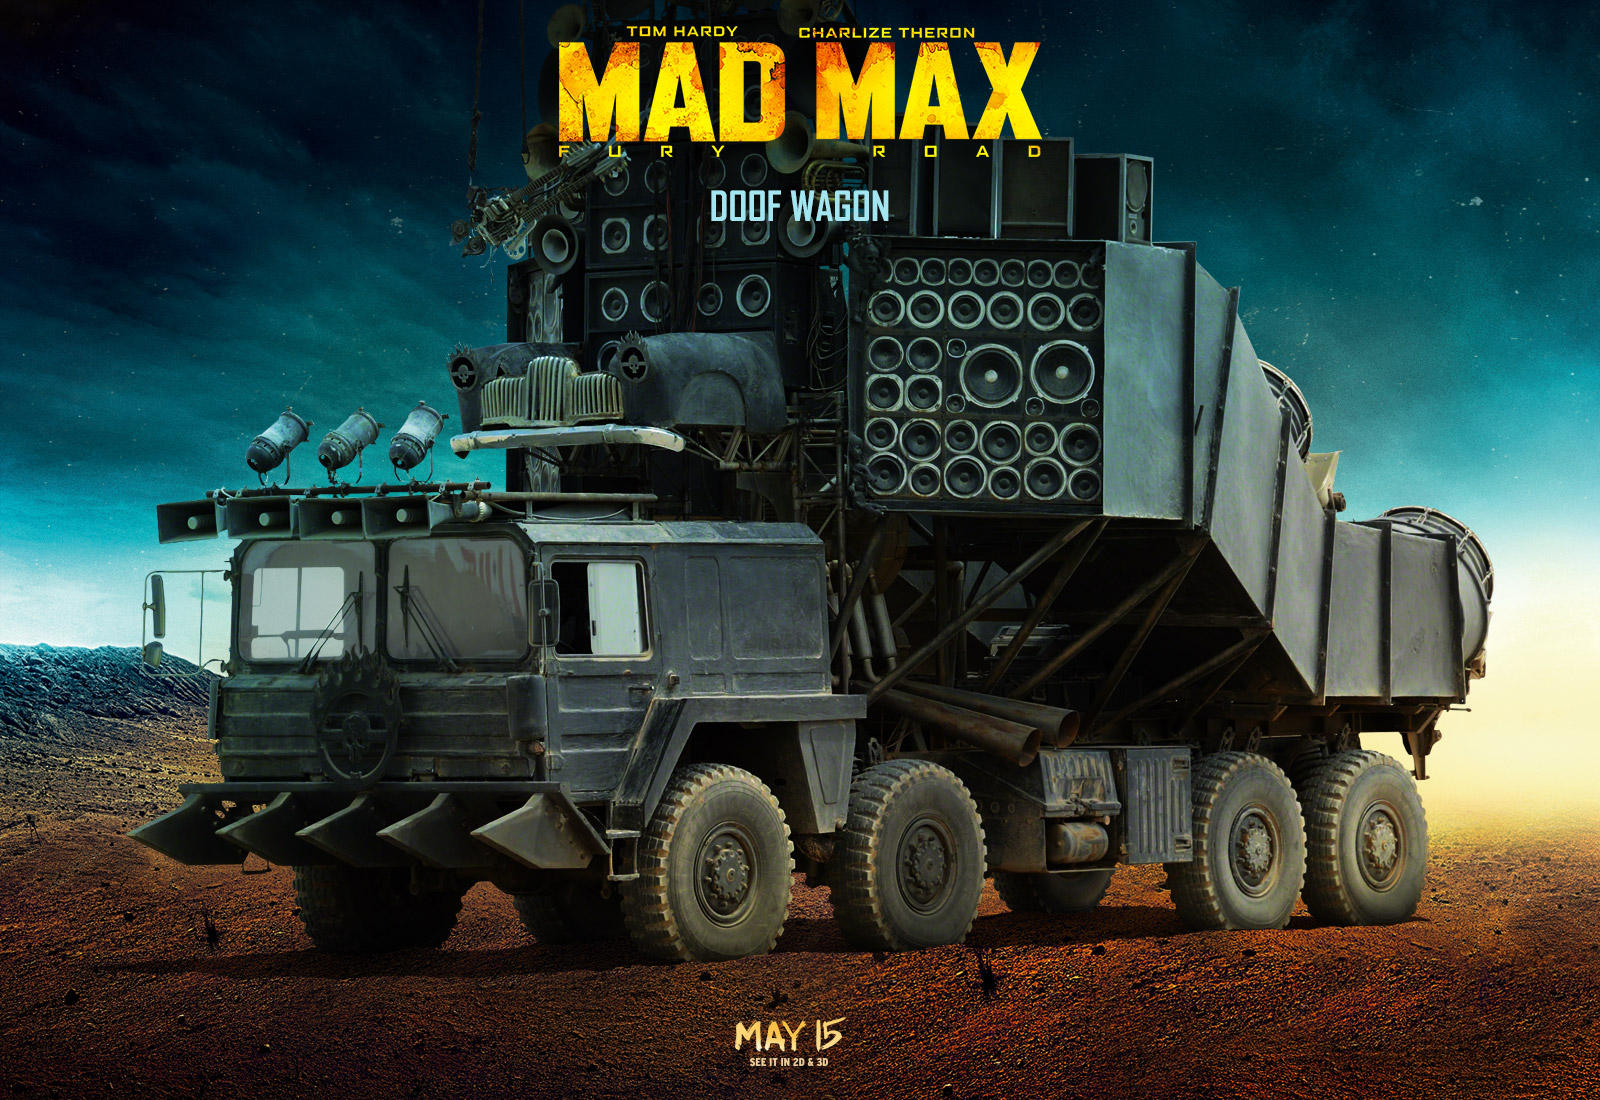 madmax-doofwagon-cars